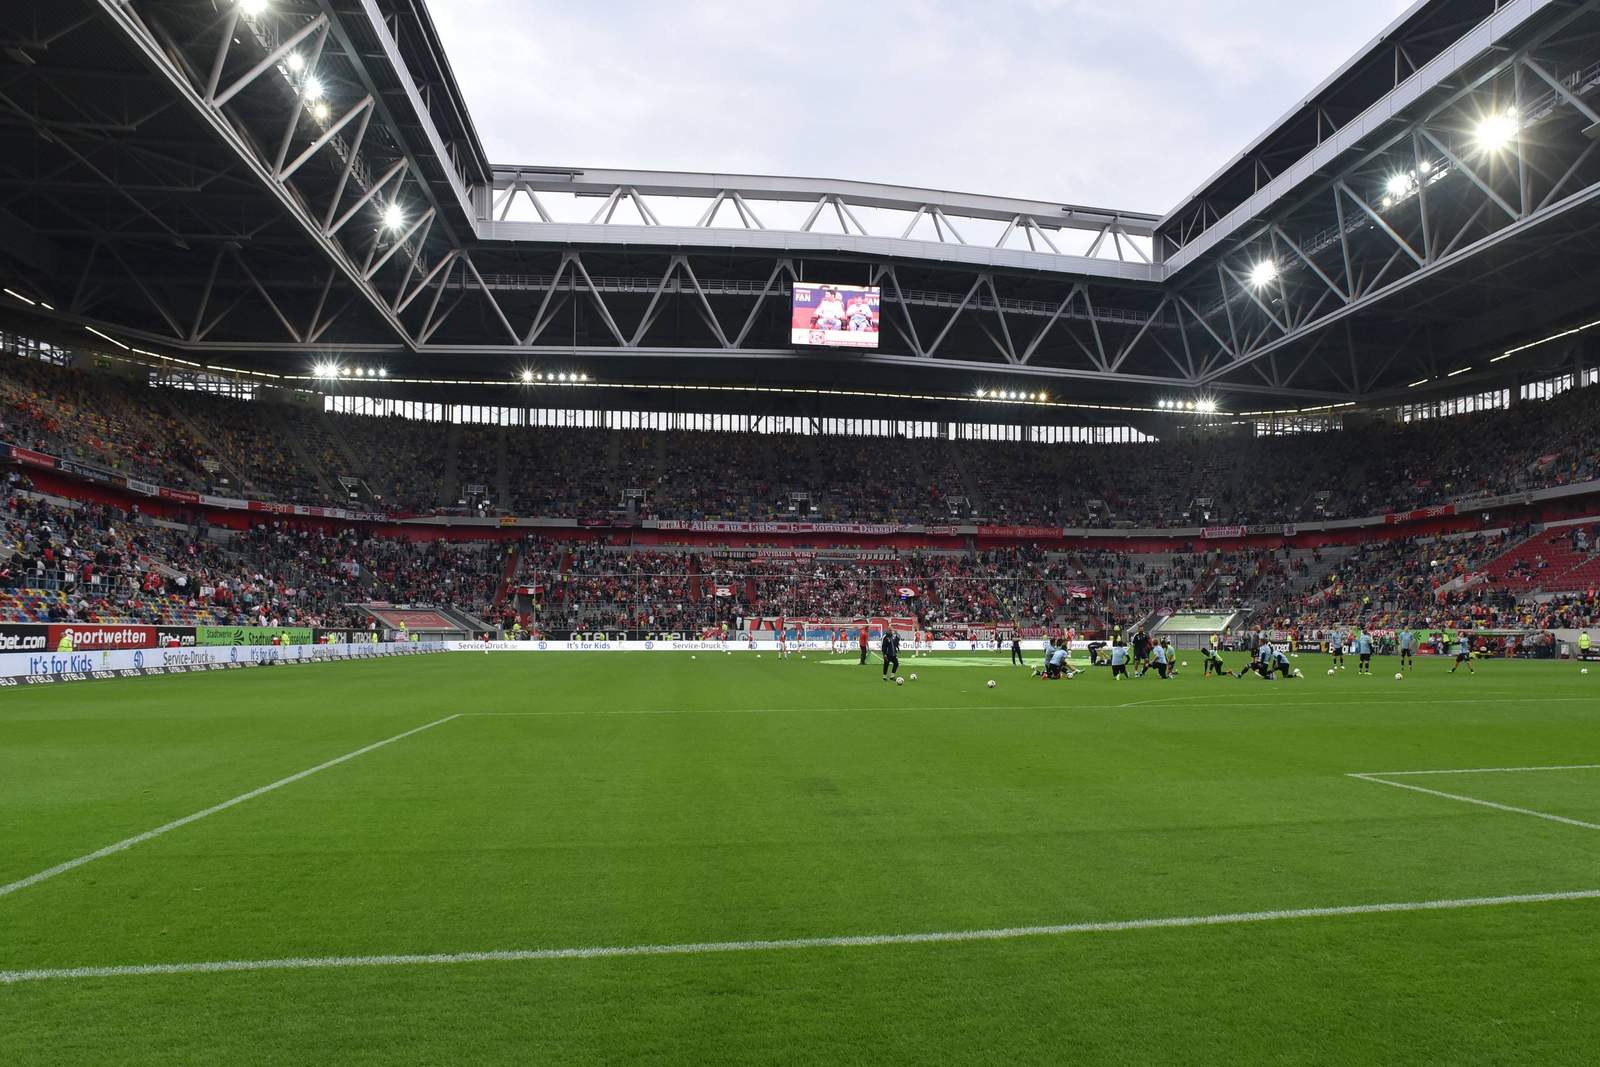 Fortuna Düsseldorf Stadion